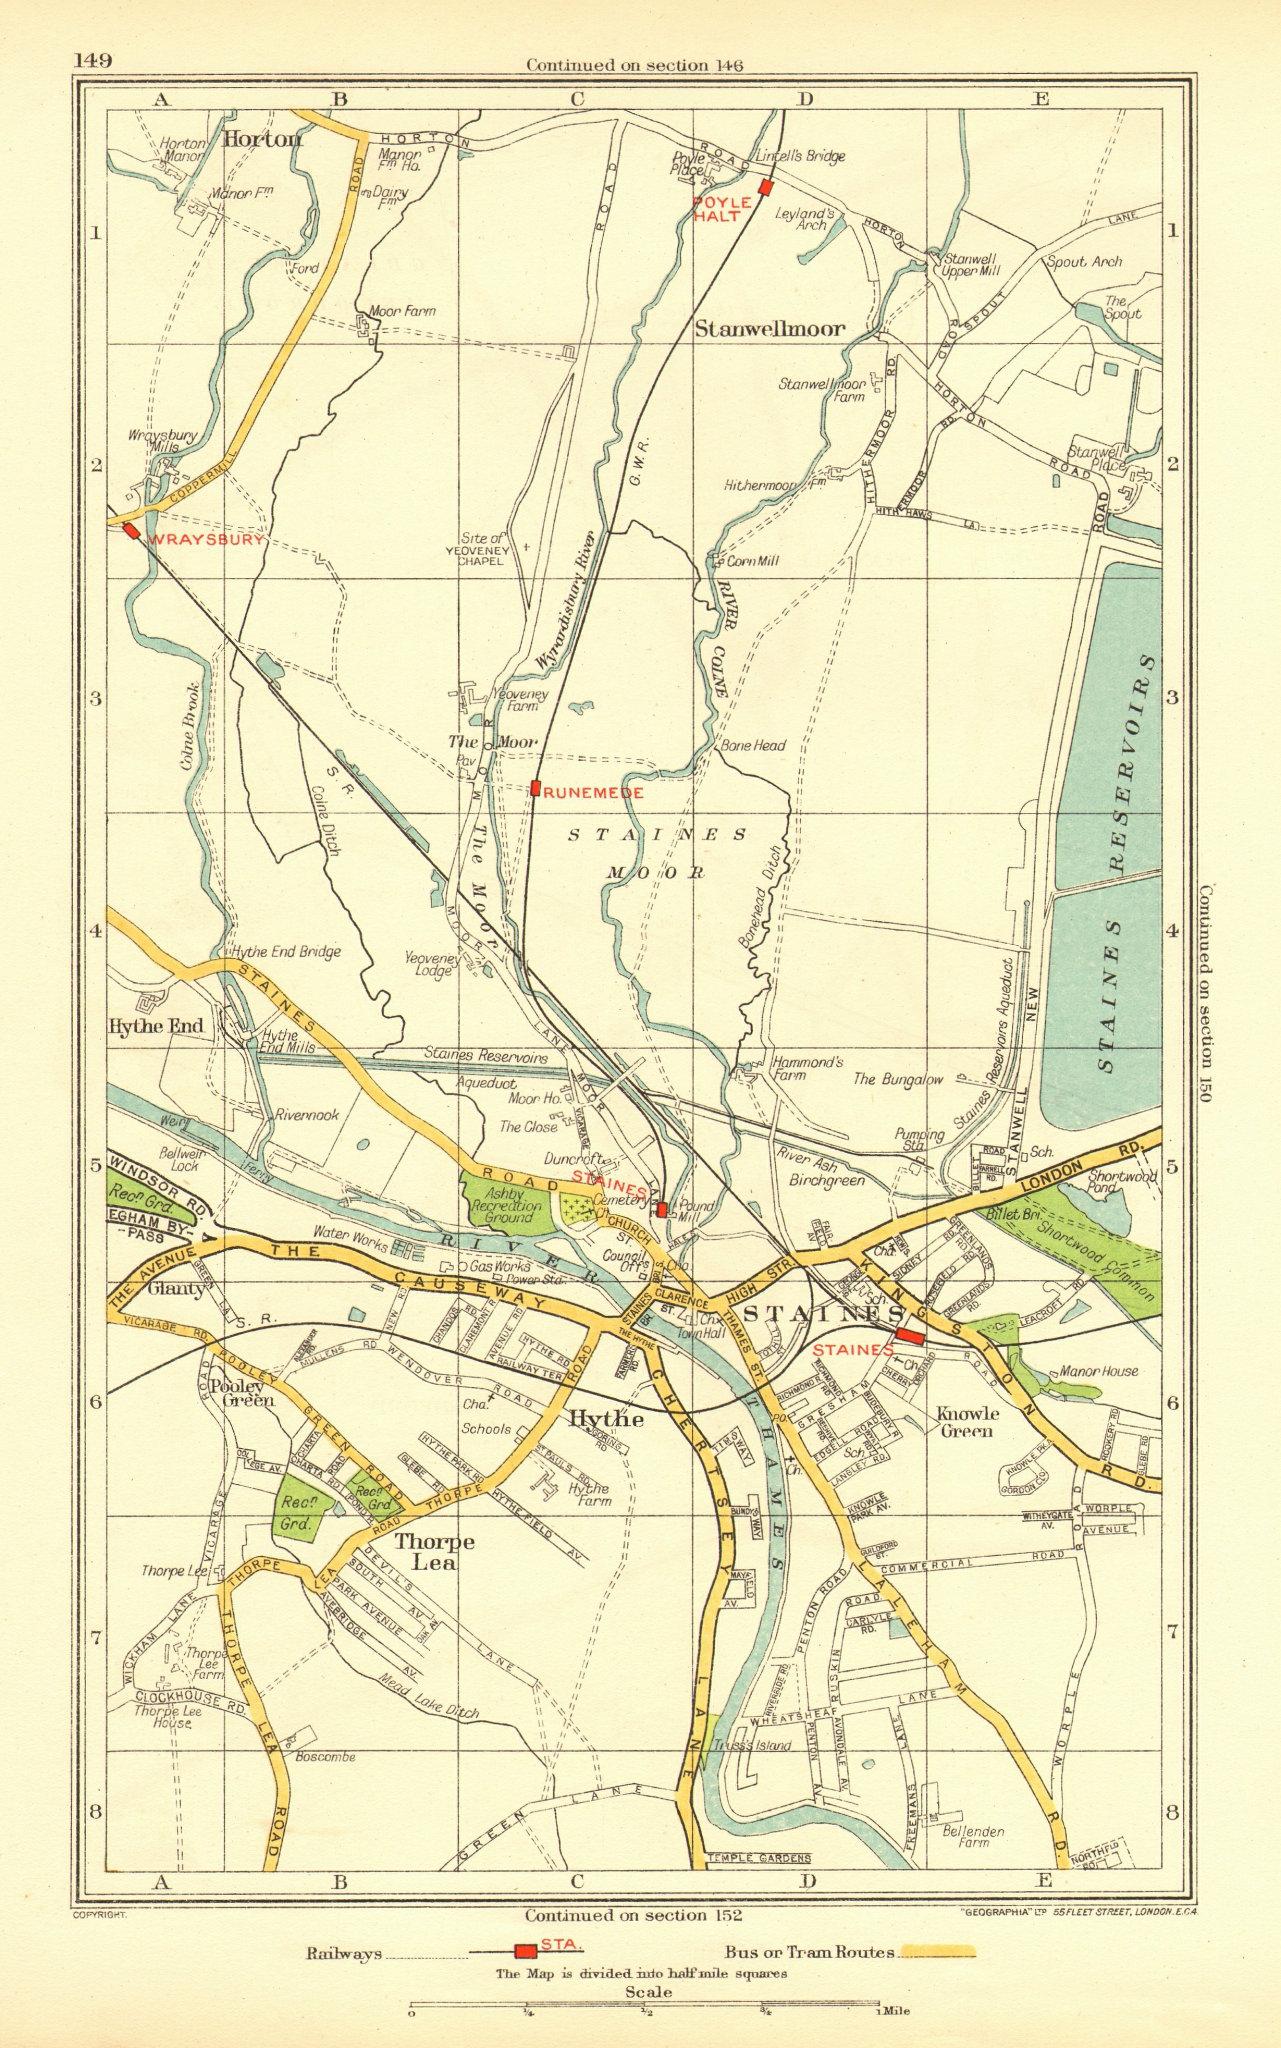 Associate Product STAINES. Egham Hythe Stanwell Moor Thorpe Hythe End Horton Wraysbury 1937 map